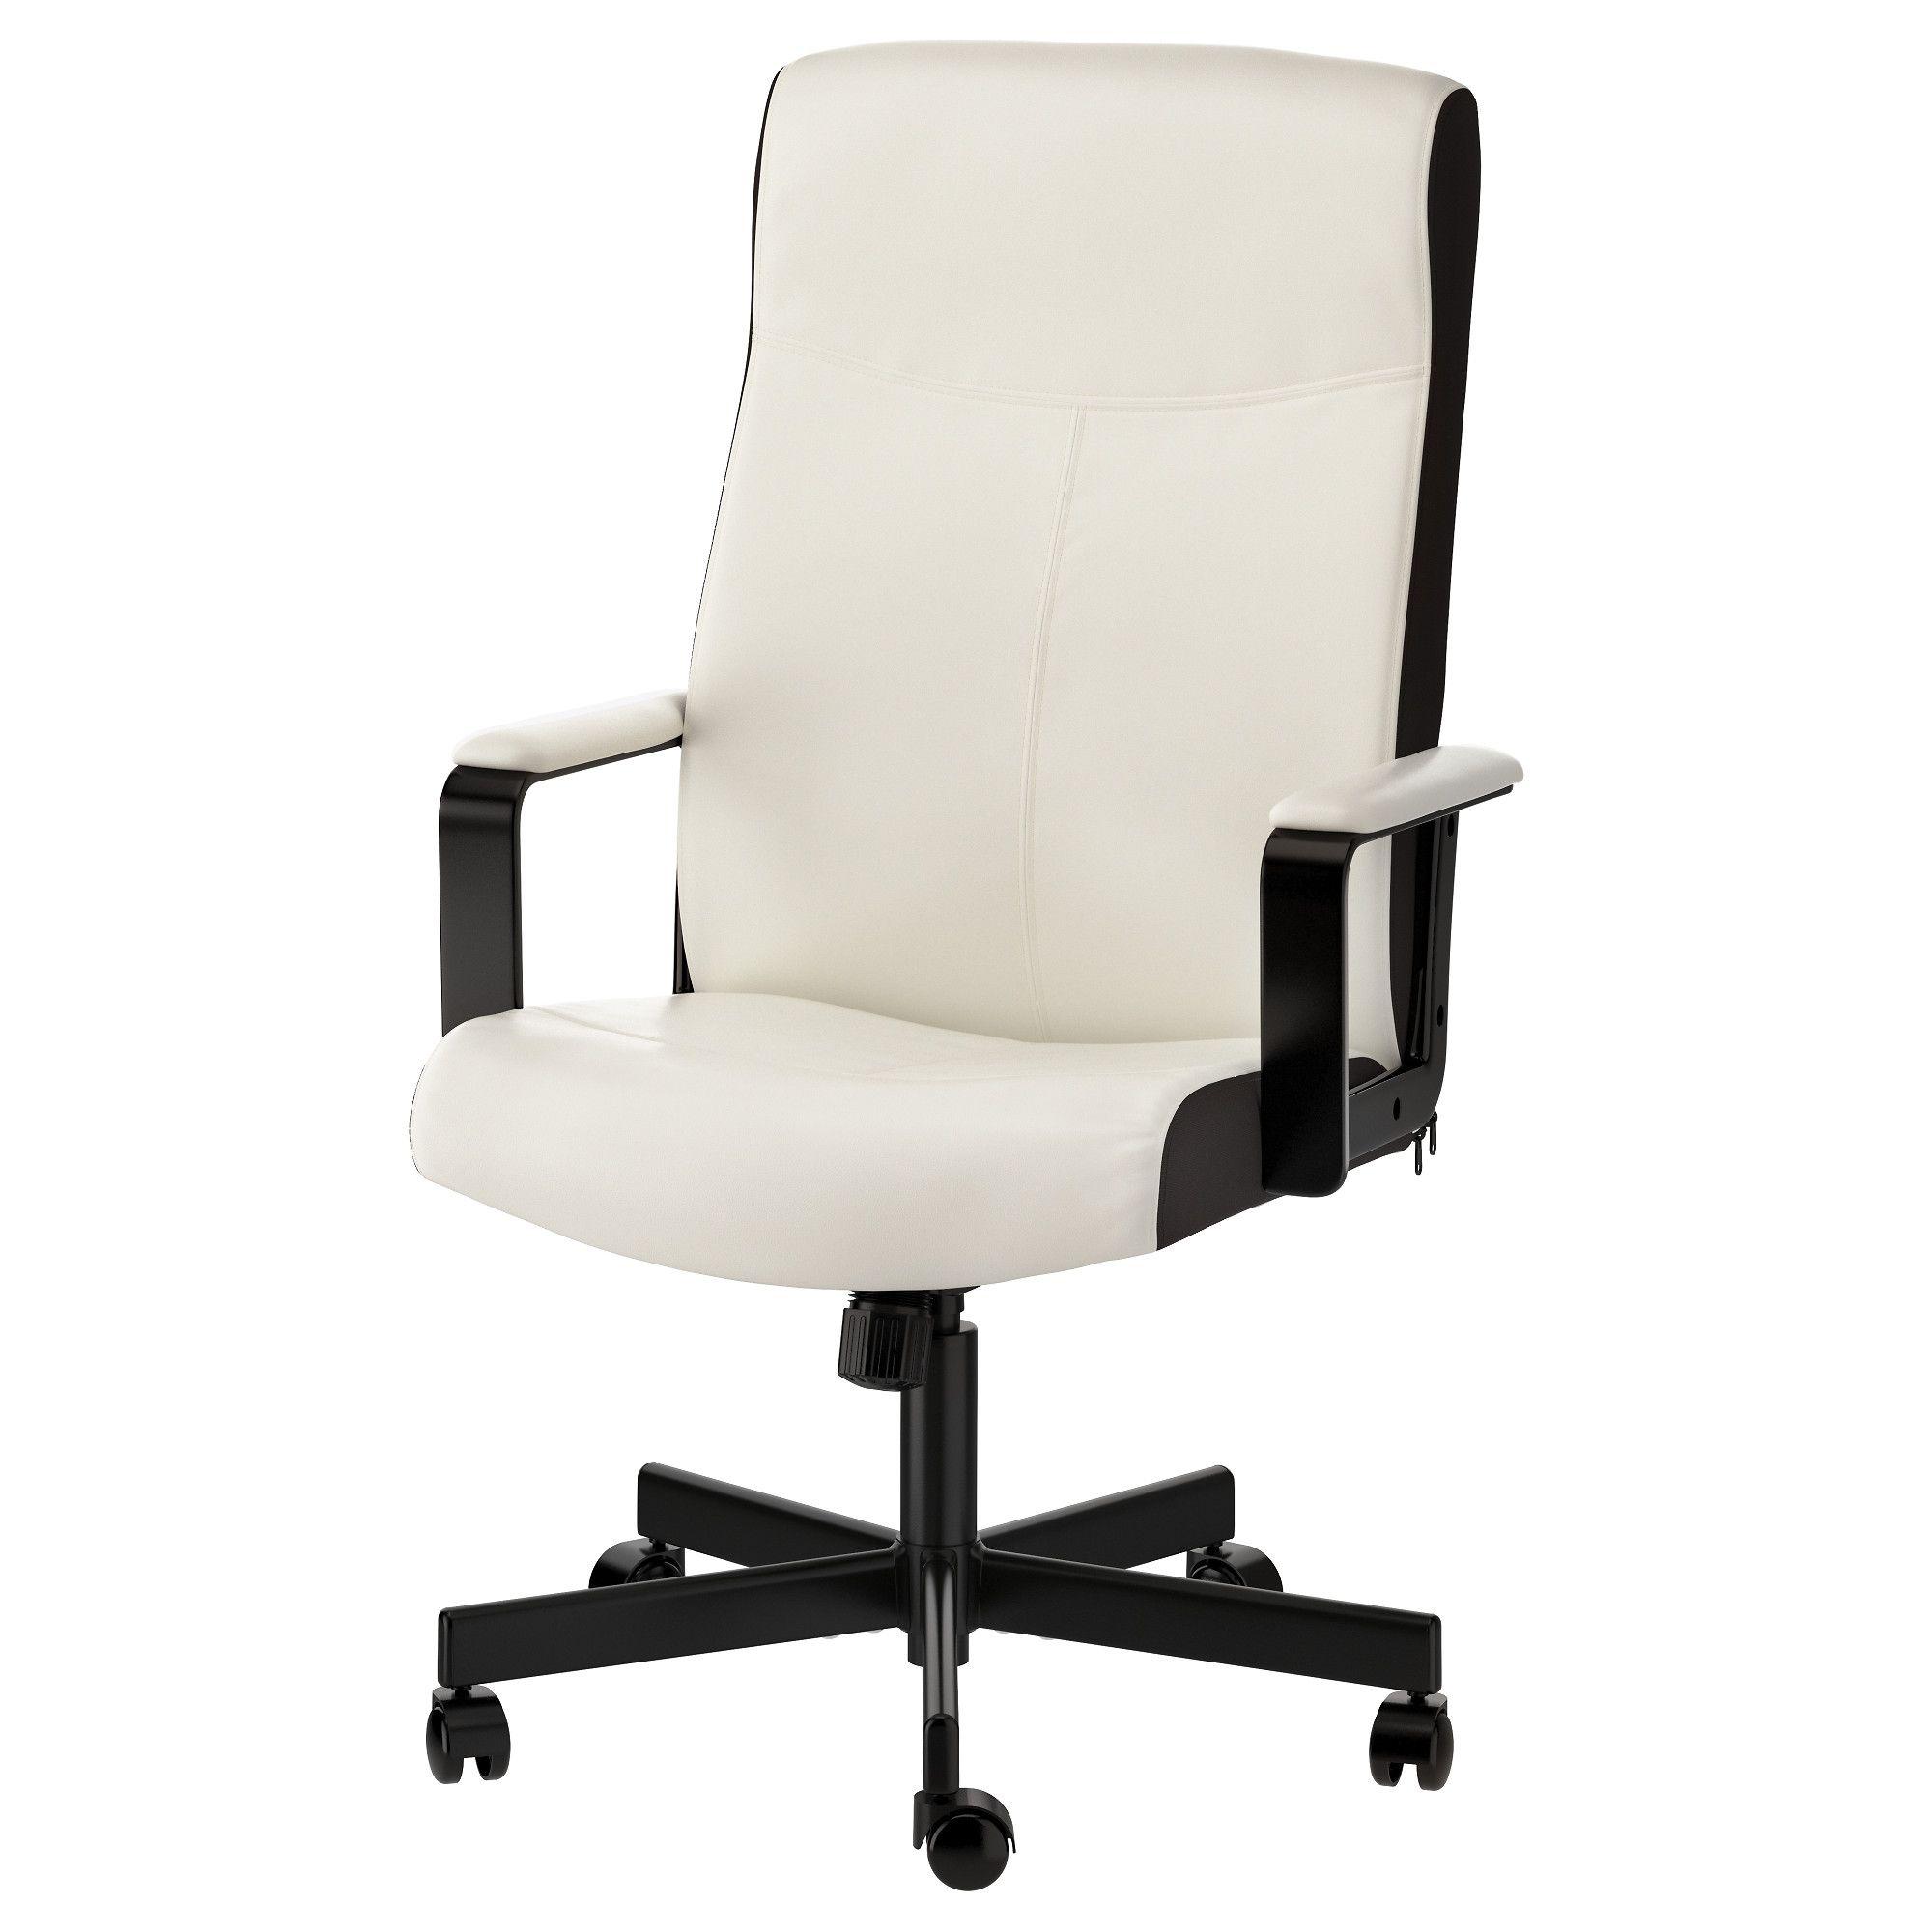 Ikea millberget swivel chair kimstad white white desk